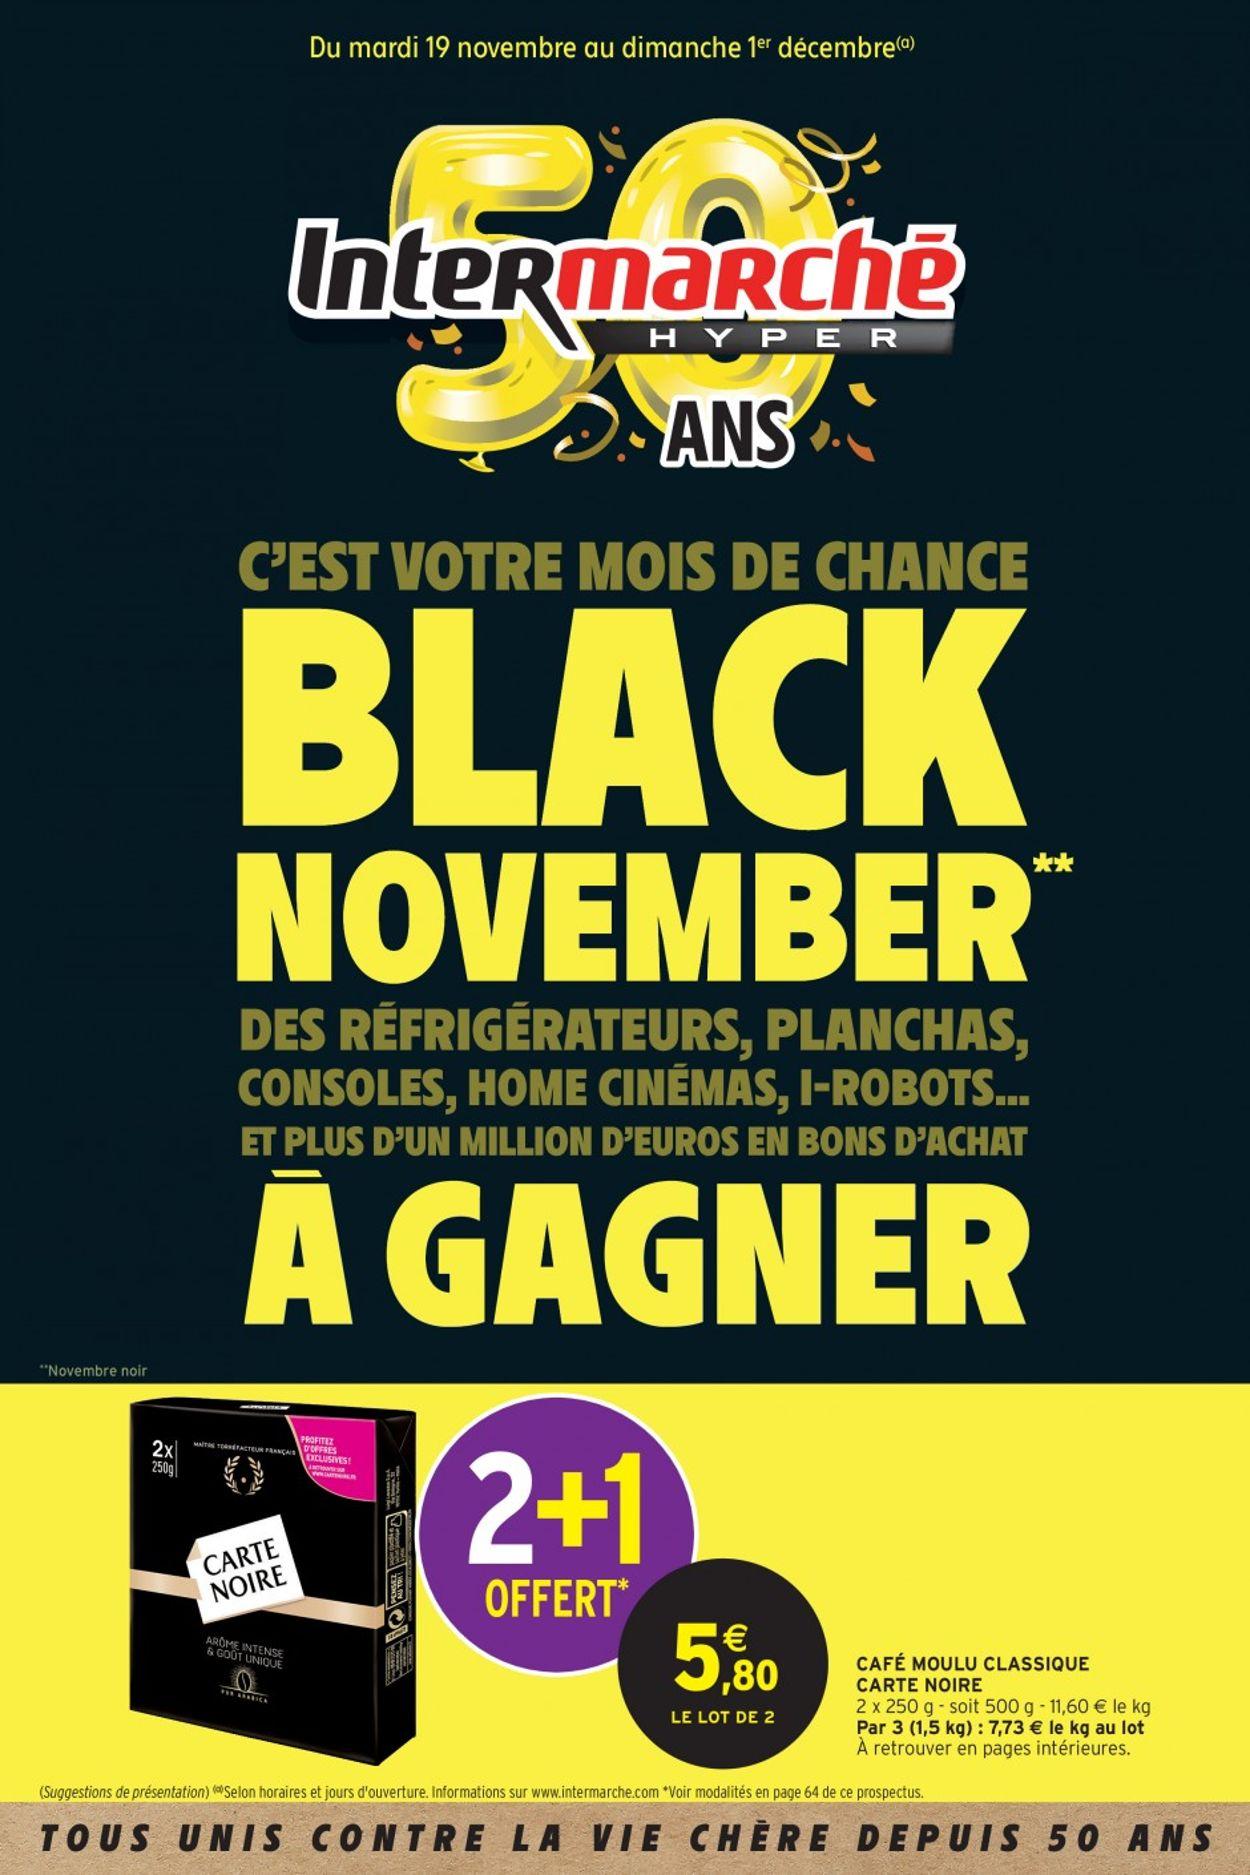 Intermarché - BLACK NOVEMBER 2019 Catalogue - 19.11-01.12.2019